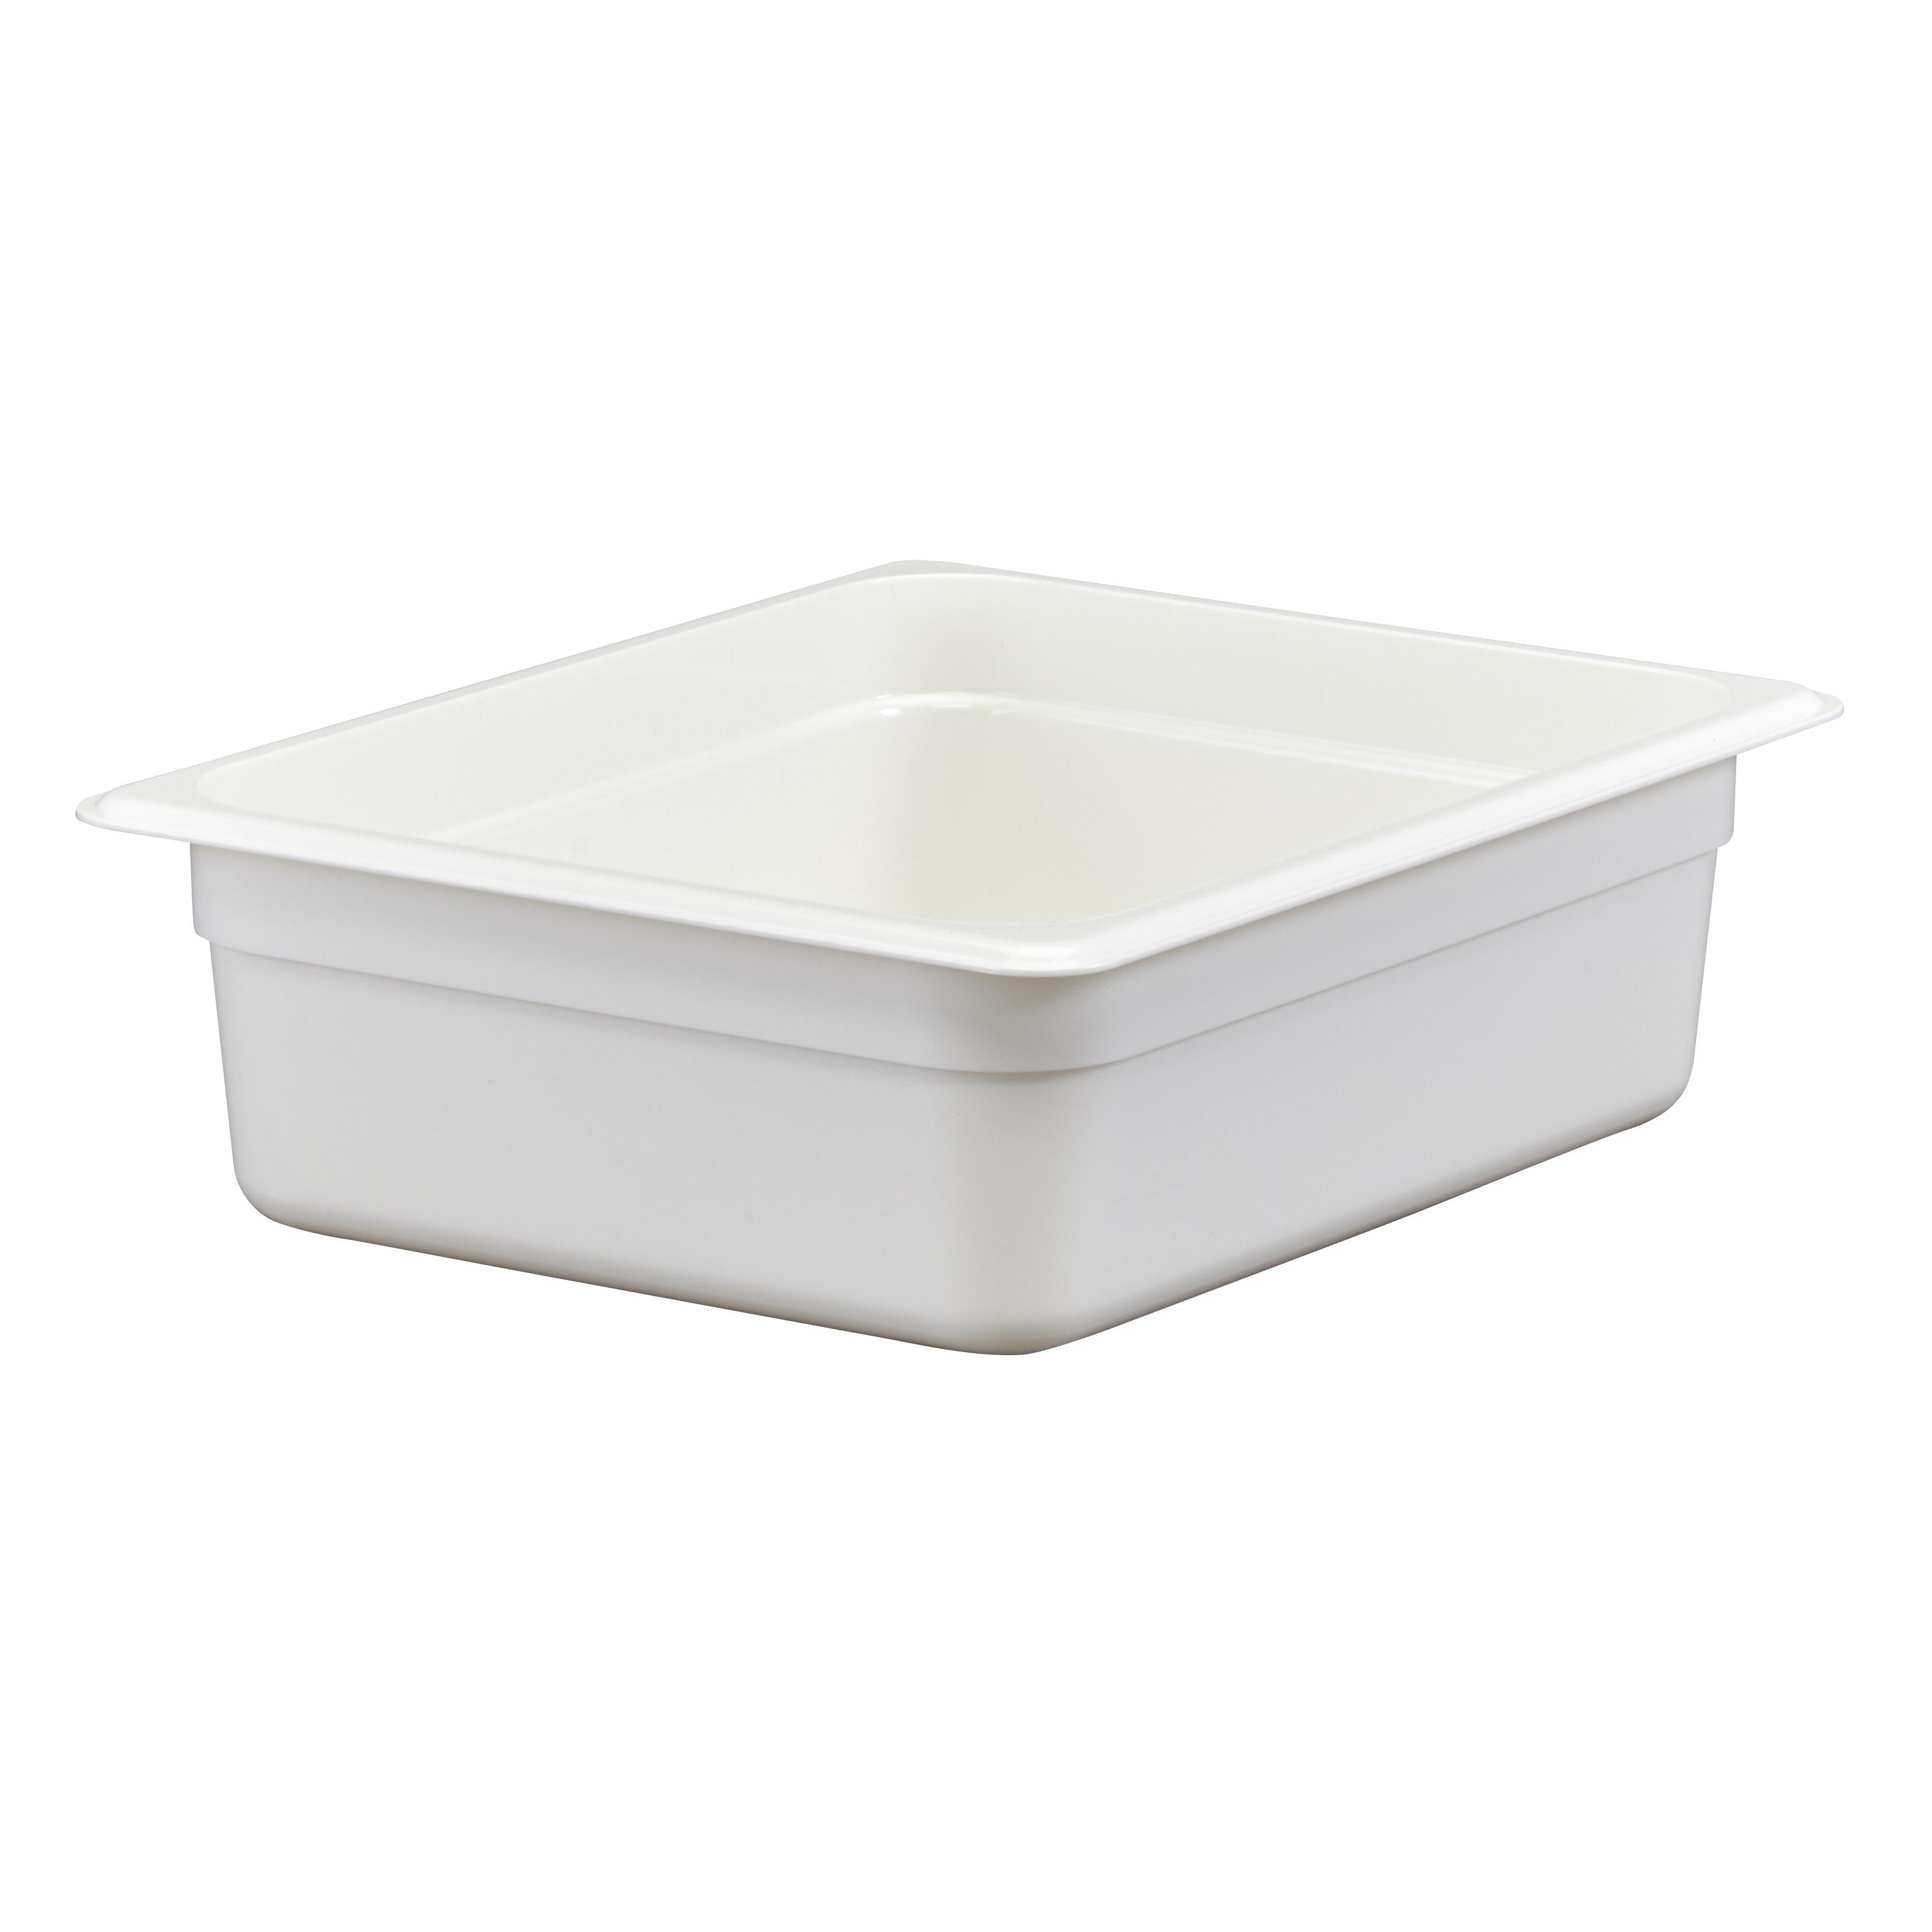 Cambro 24CW148 food pan, plastic